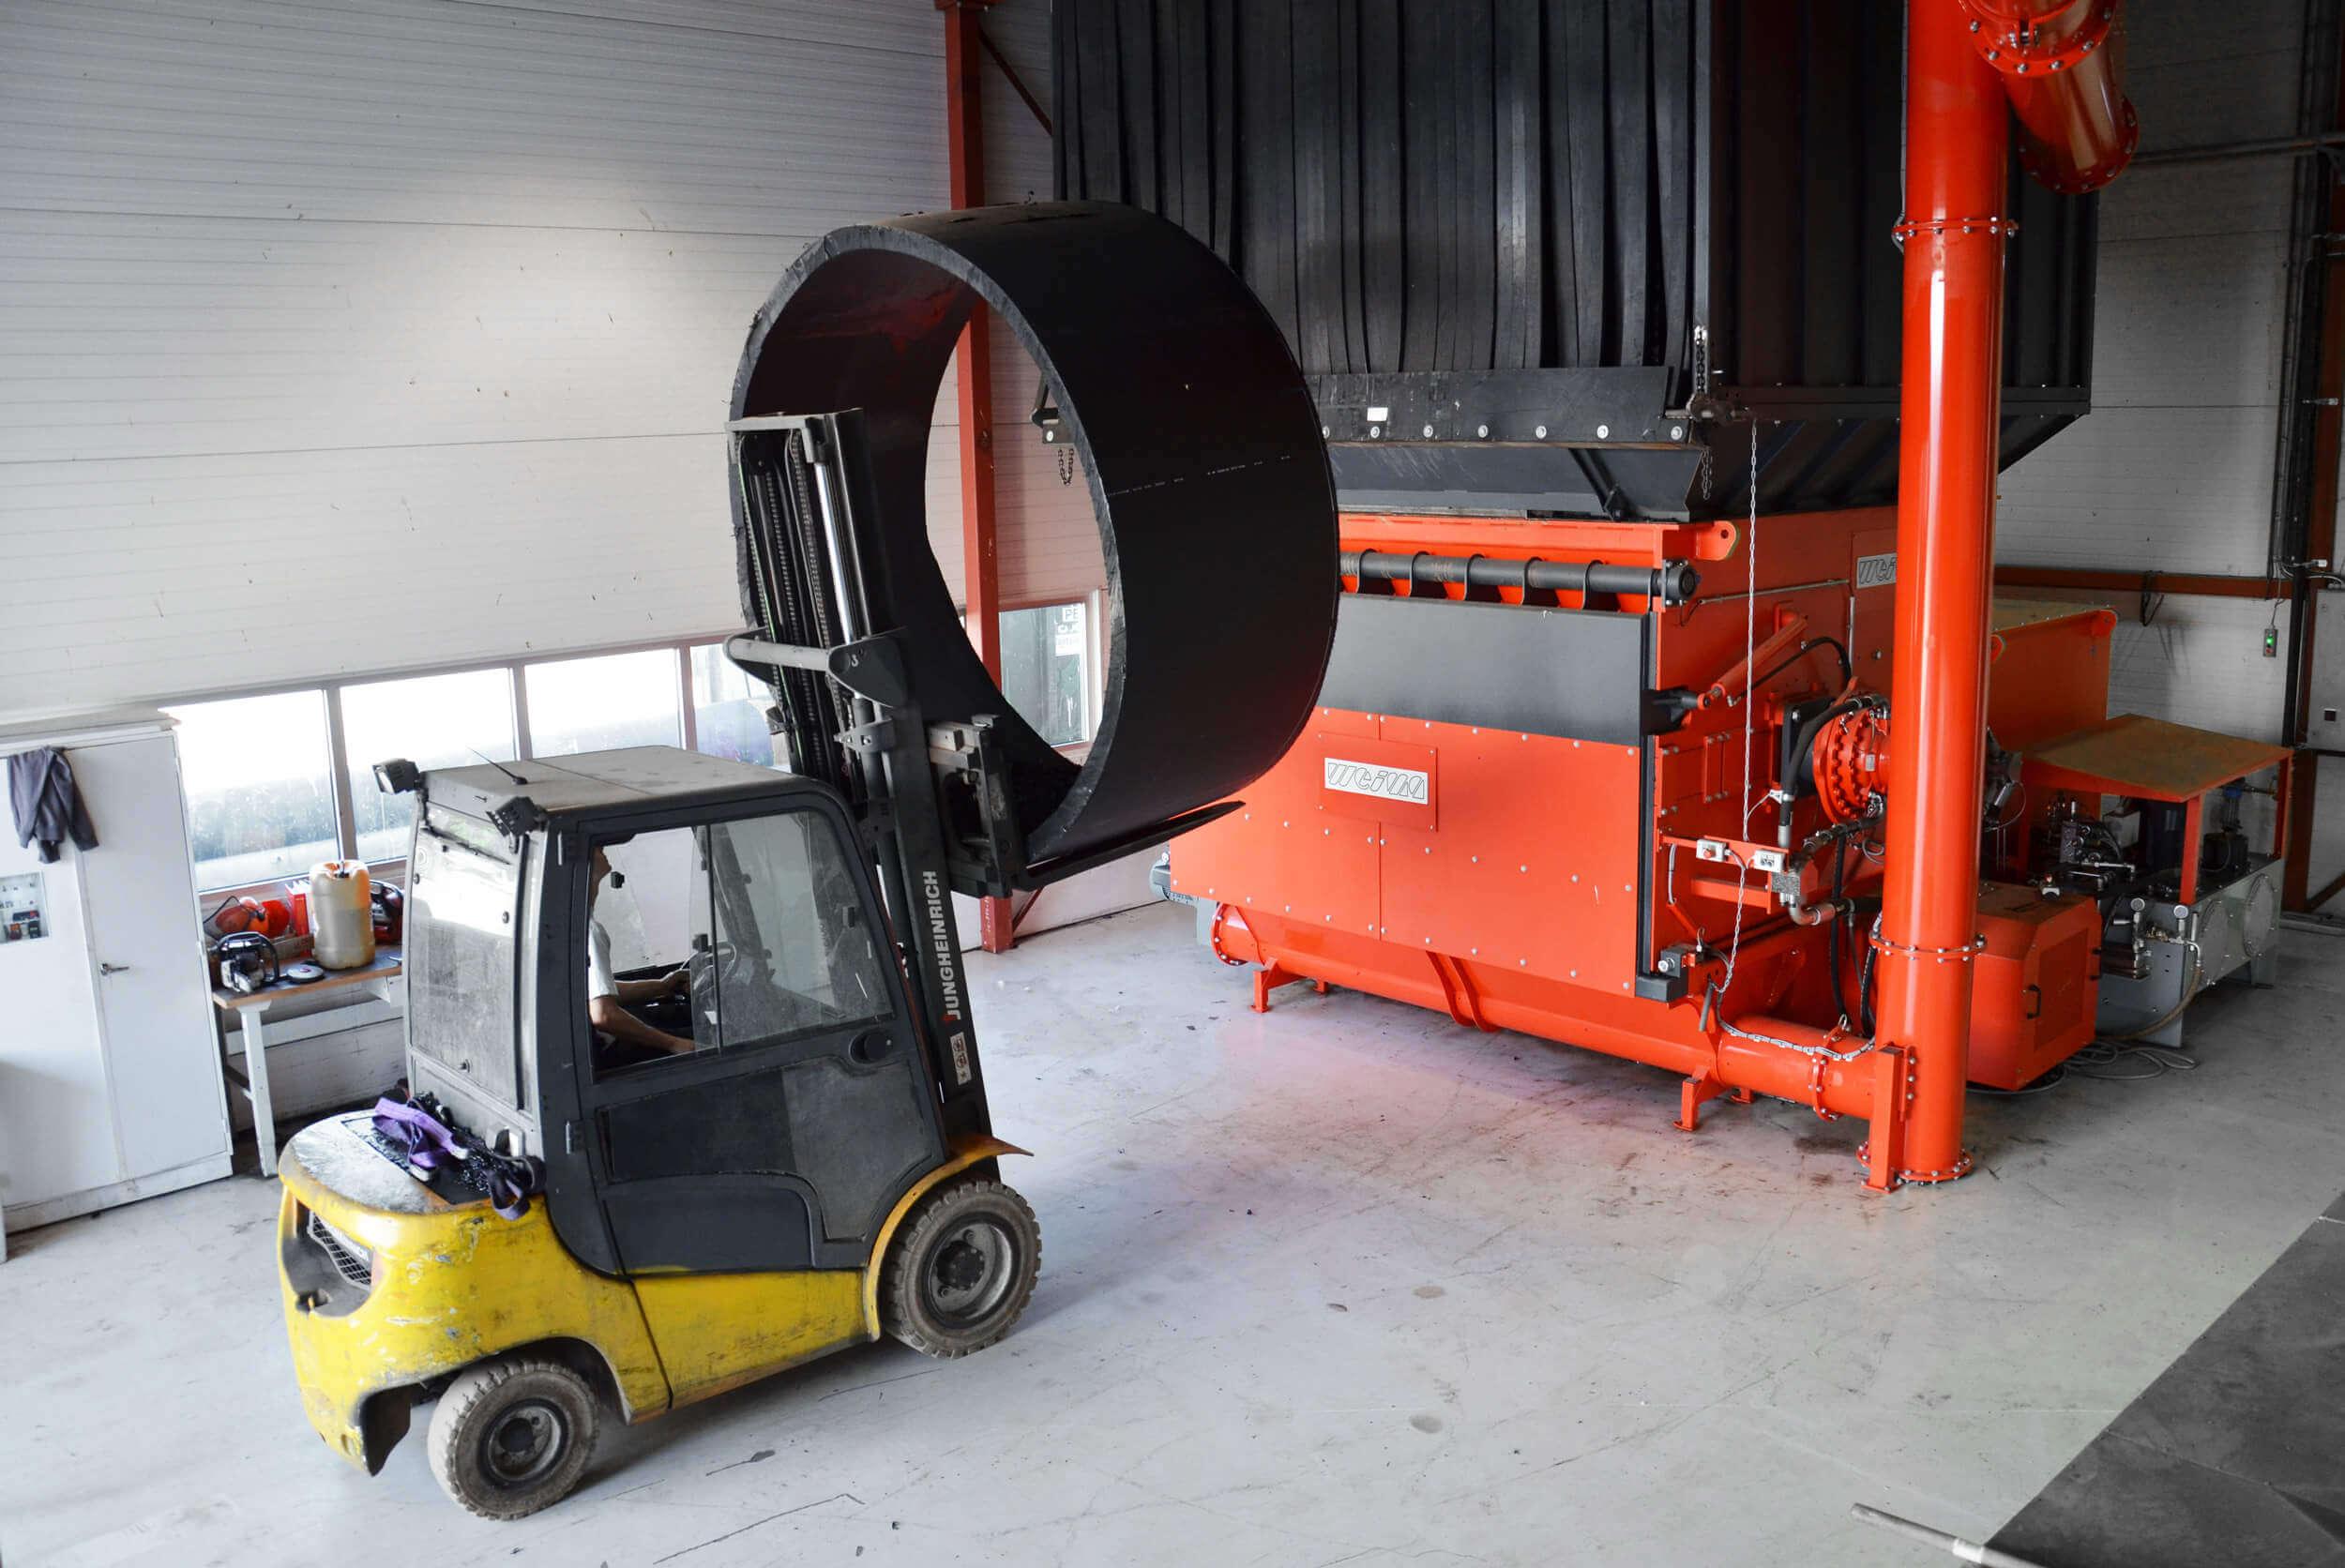 Wheel loader loads huge pipe cuttings into the WEIMA WLK Super Jumbo single-shaft shredder